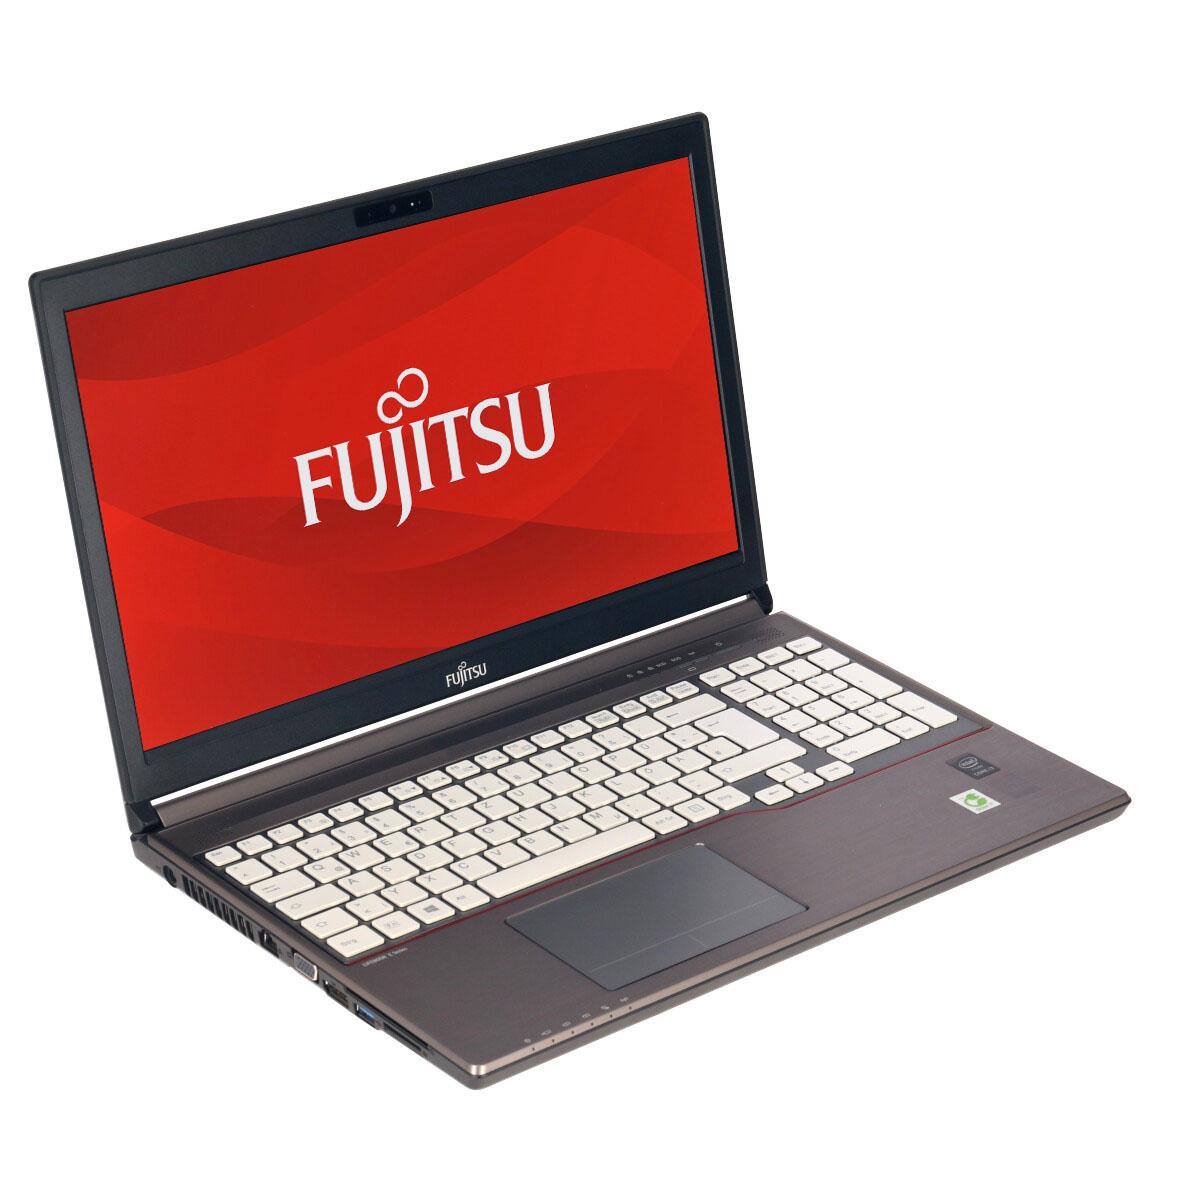 Fujitsu LifeBook E756 (weiße Tastatur)  - shop.bb-net.de